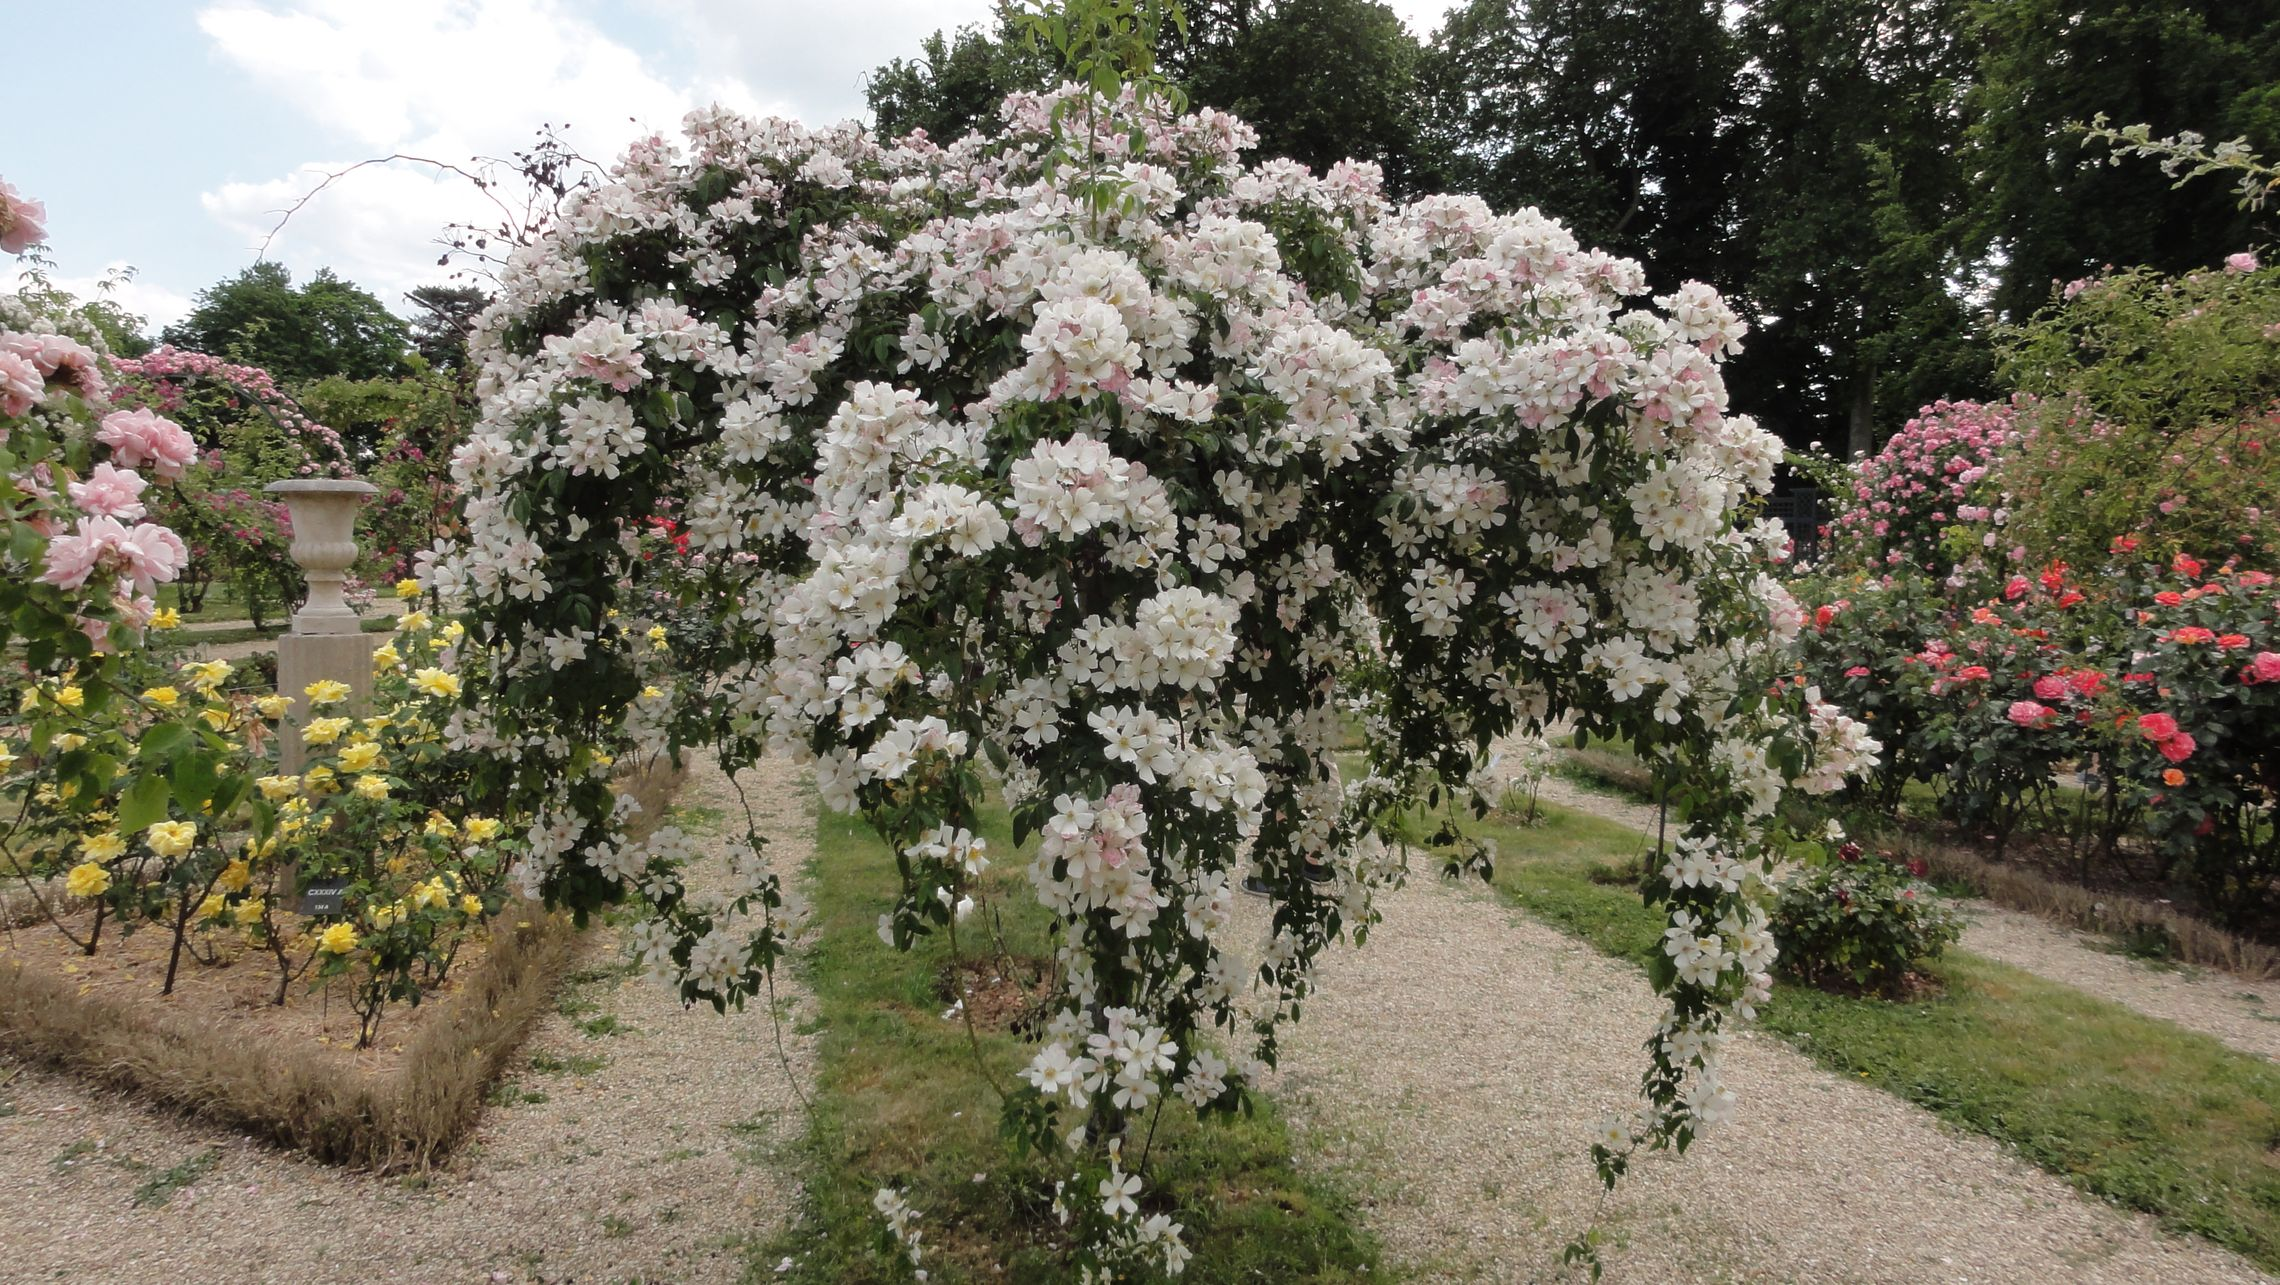 20170602 roseraie vdm 11